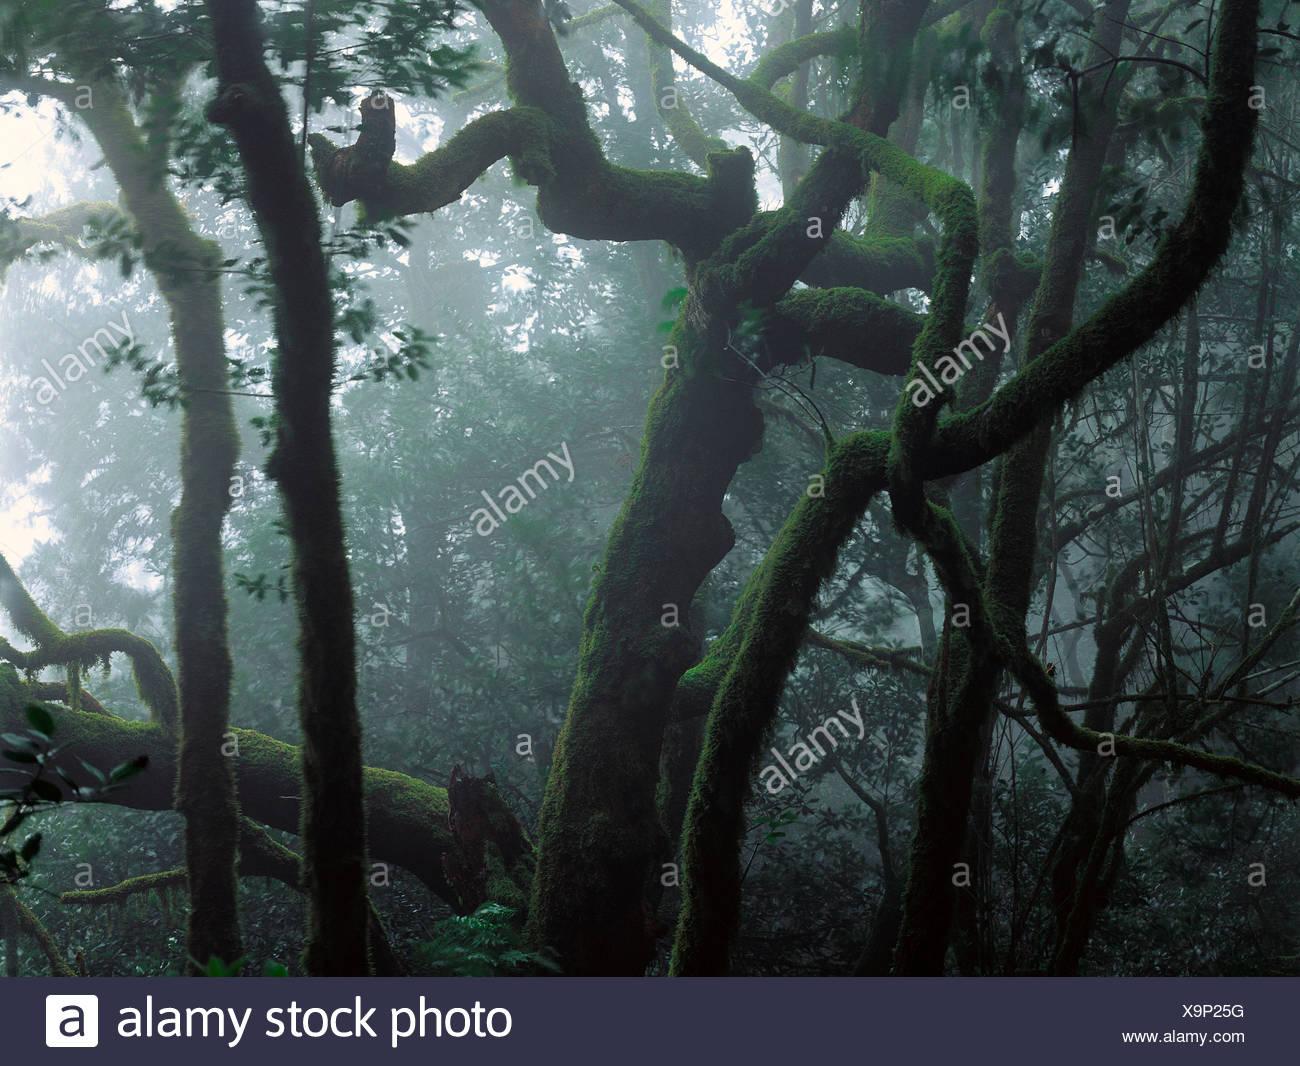 Laurisilva (Lorbeerwald primitiv). Nationalpark Garajonay. La Gomera. Kanarischen Inseln. Spanien Stockbild